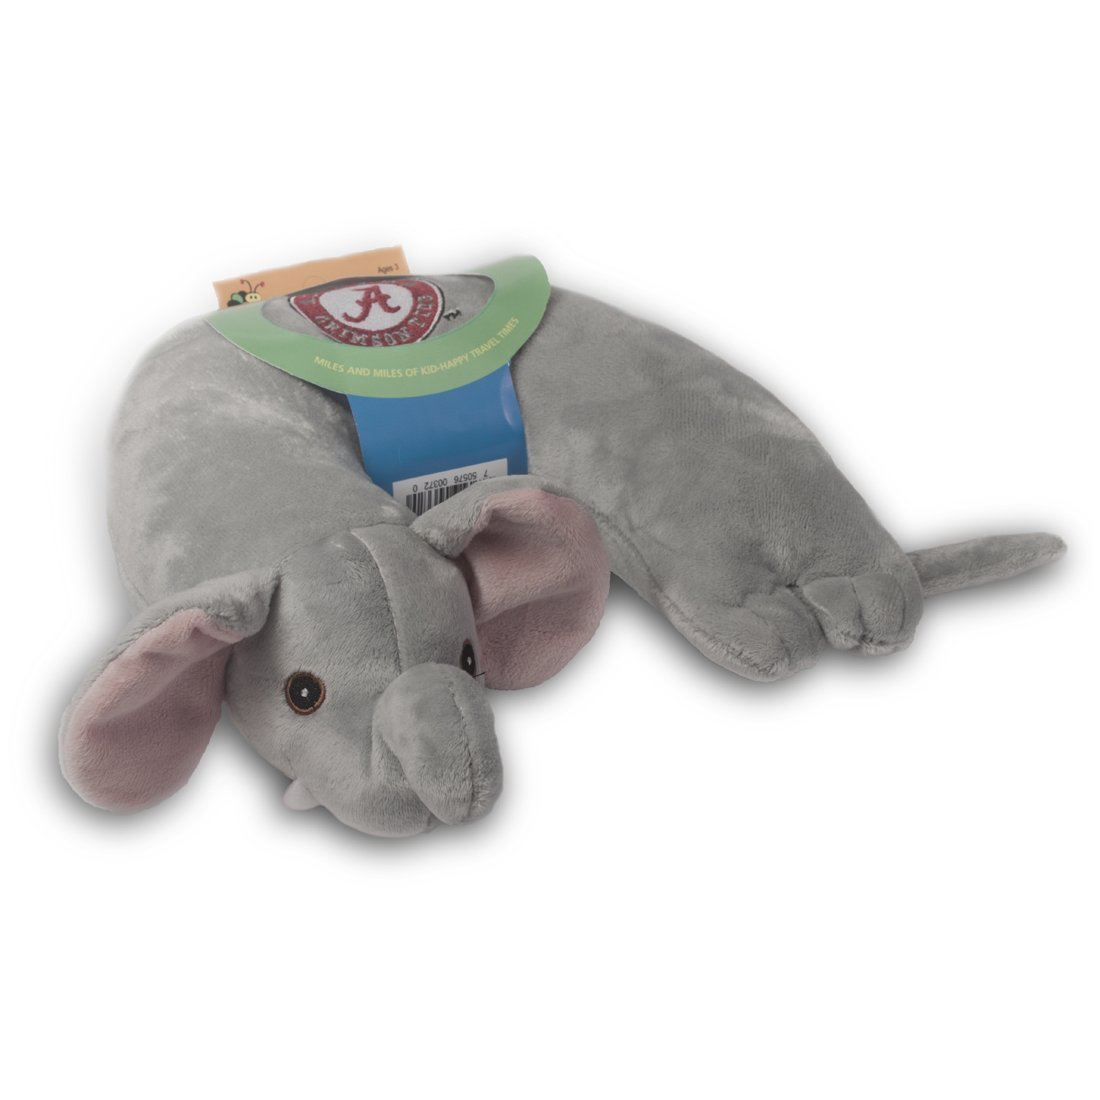 Critter Piller NCAA Kids Travel Neck Pillow Alabama Crimson Tide Grey Elephant 2216UAL